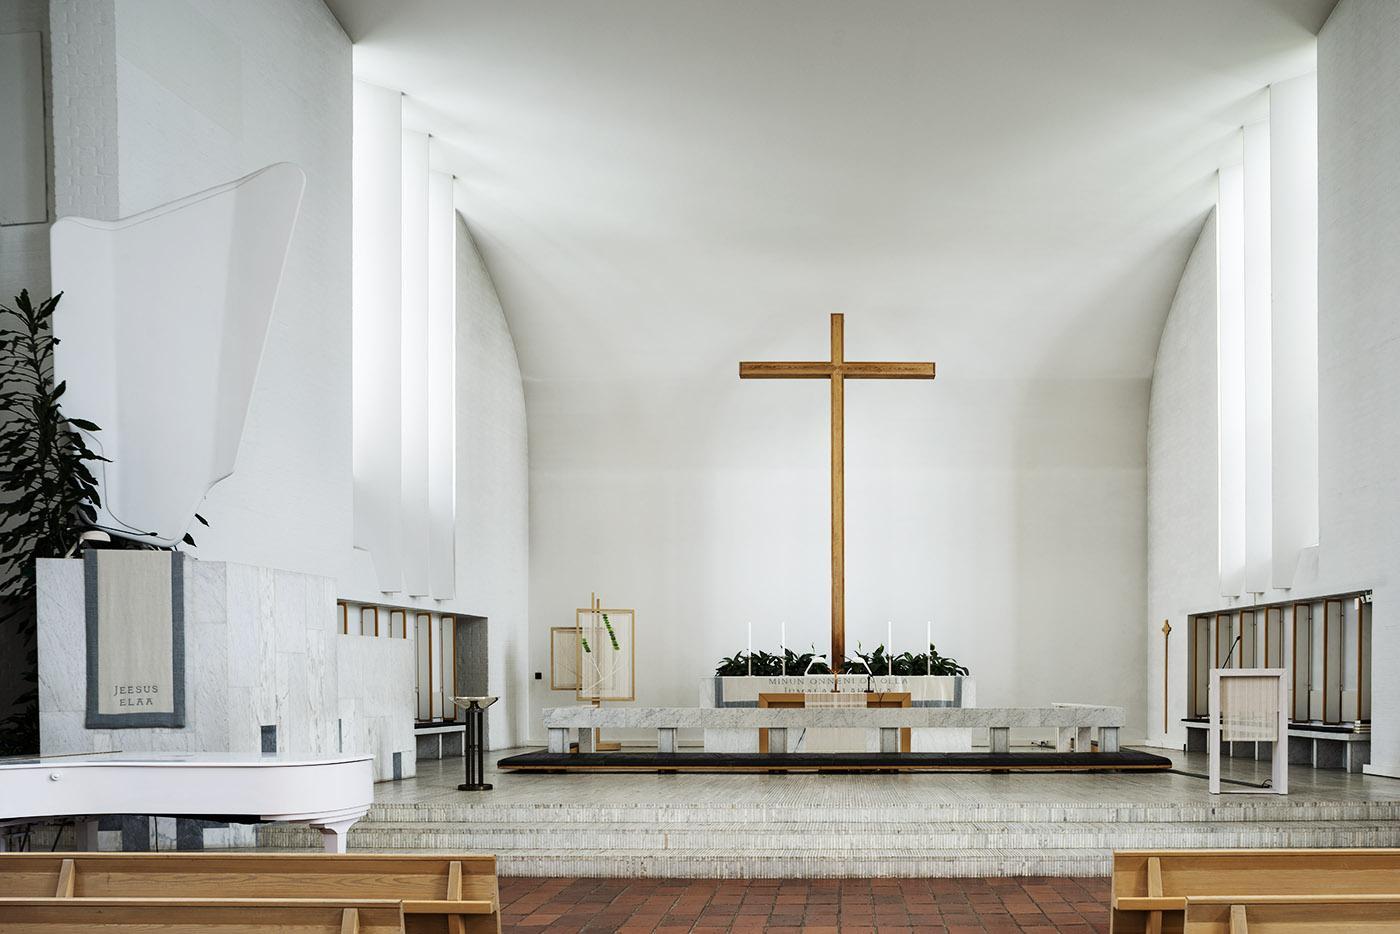 Lakeuden Ristin kirkon alttari ja puuristi